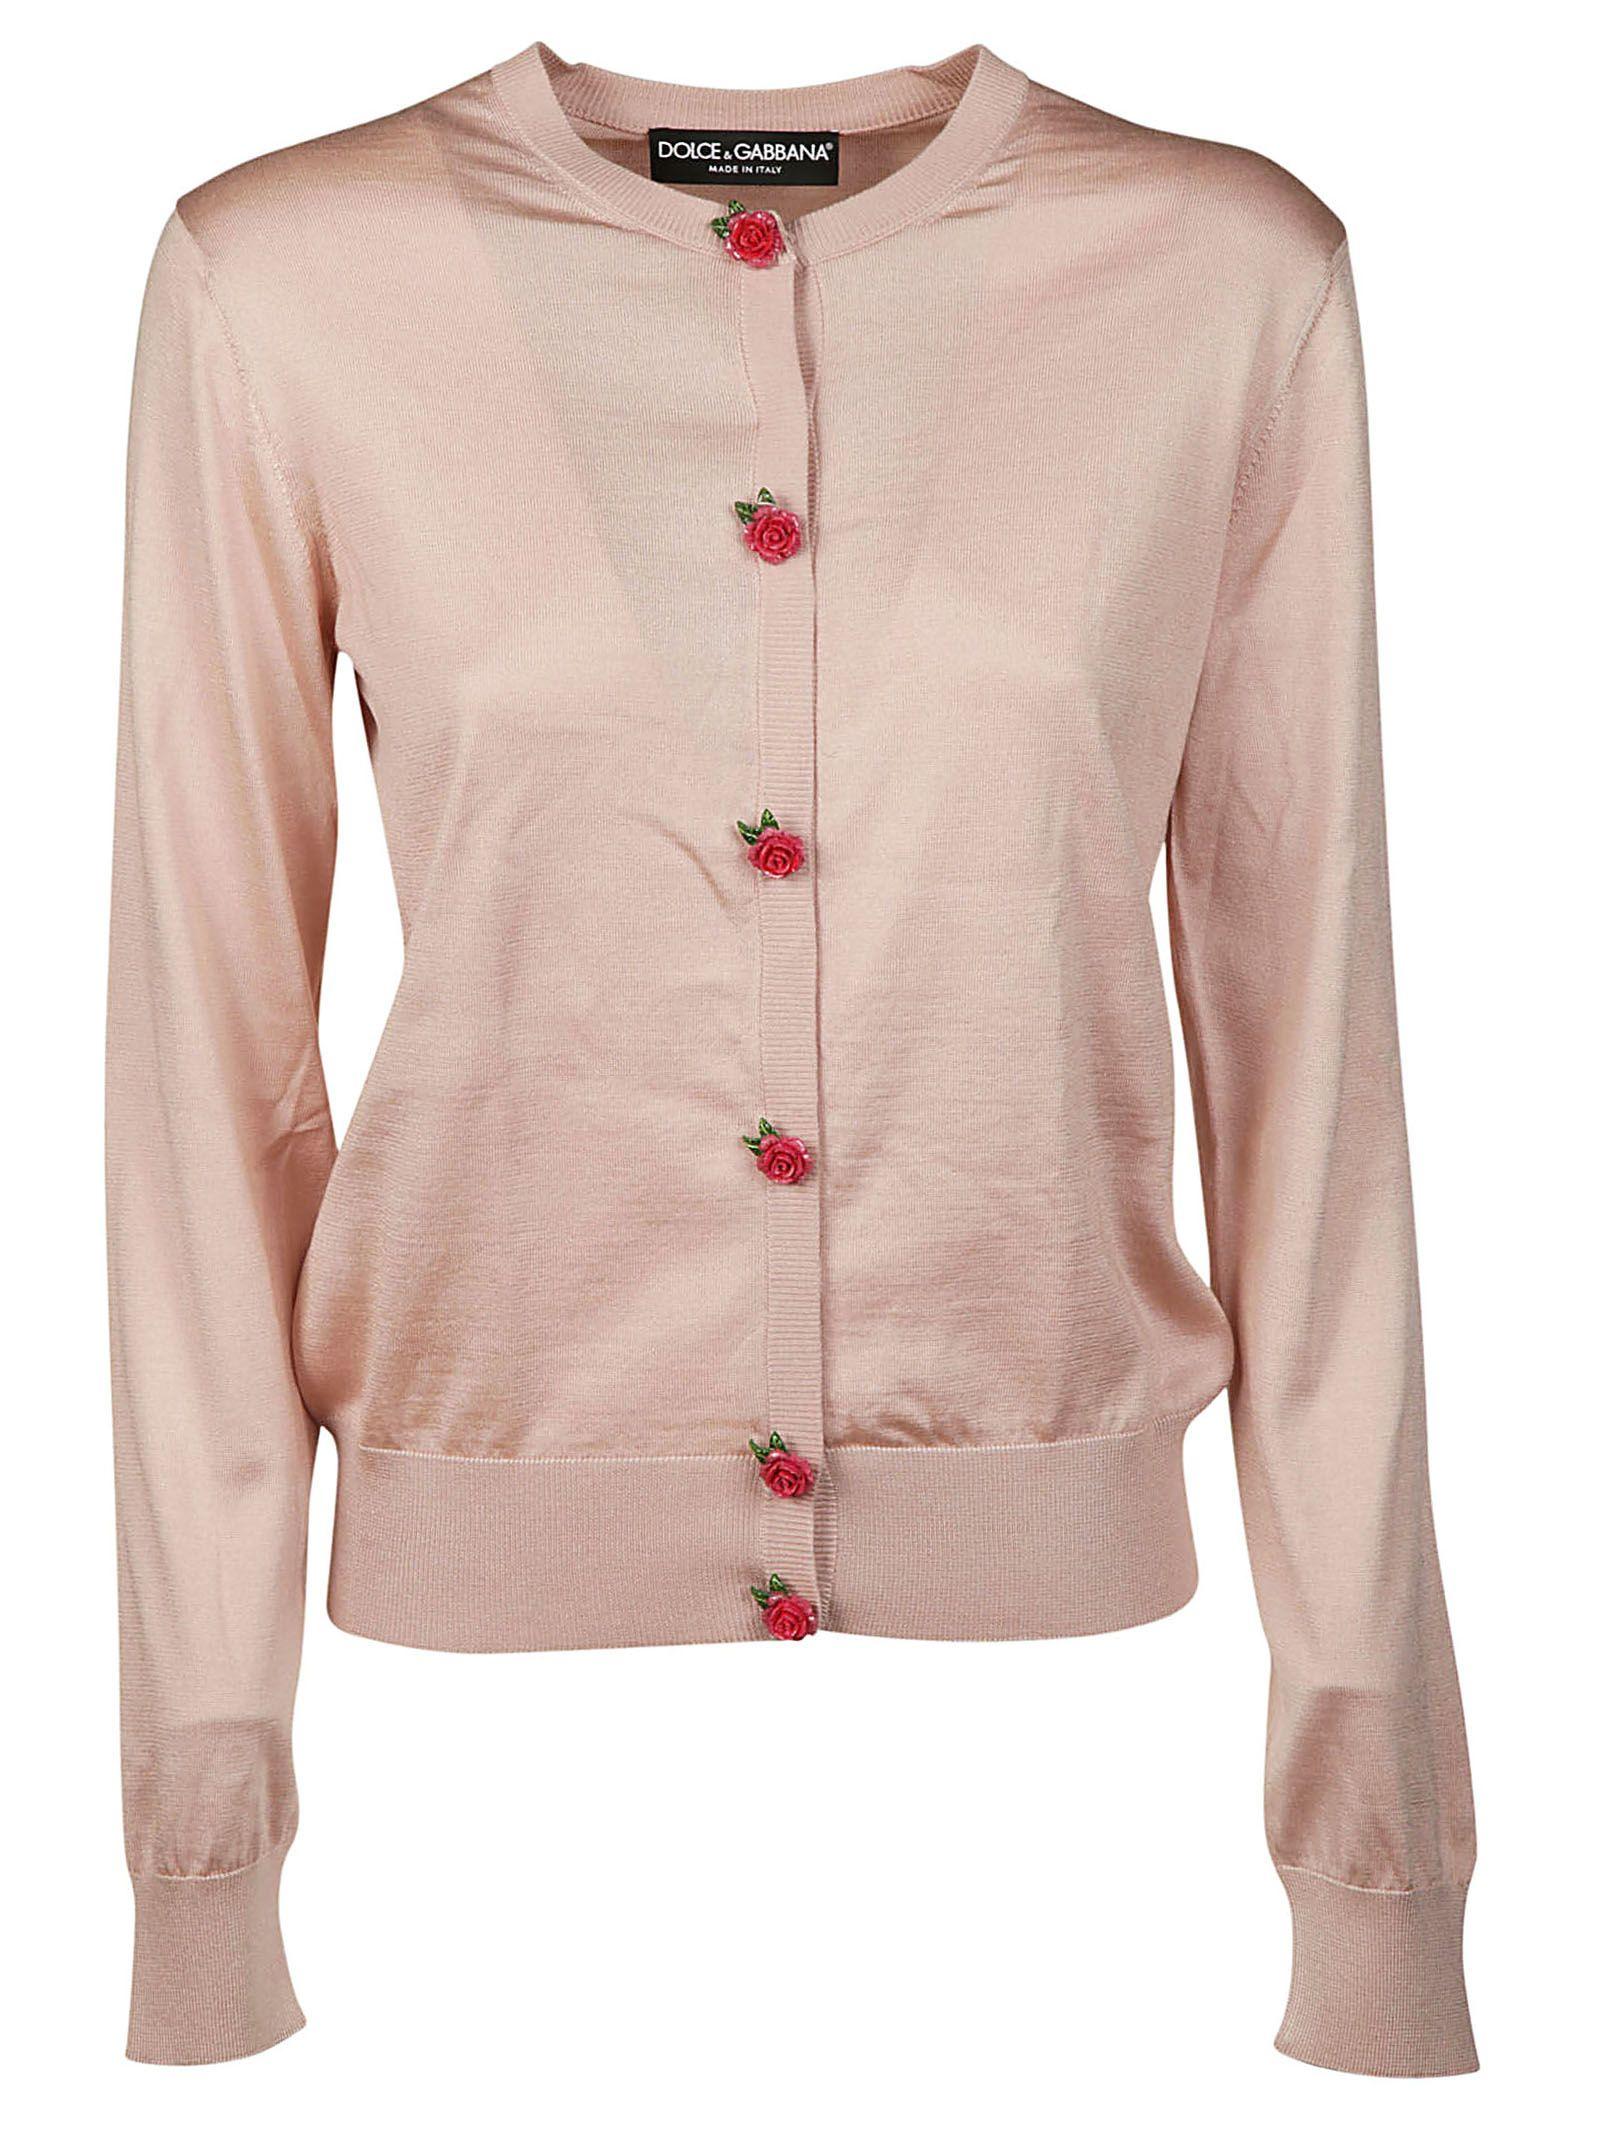 Dolce & Gabbana Rose Embellished Cardigan